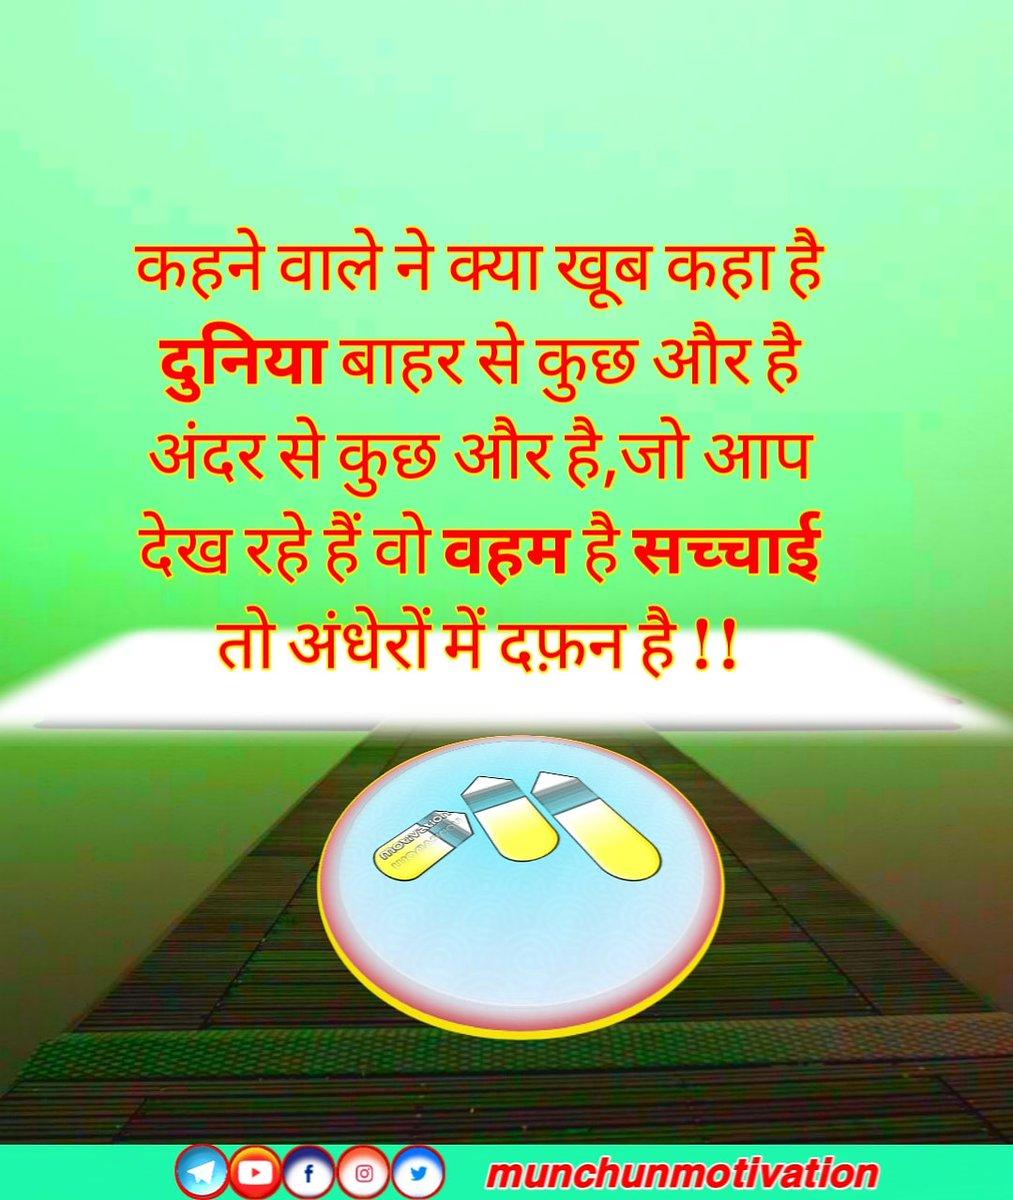 Motivation Quotes. #goodmorning #goodmorningpost #motivationquote #motivation #munchunmotivate #bestquotes #bestmotivation #suvichar #lifelesson #life #sikh #bestmotivationalquotes #motivationalquotes #indianmotivation #hindimotivationalquotes #hindimotivationpic.twitter.com/cK4Lm0Q5xu